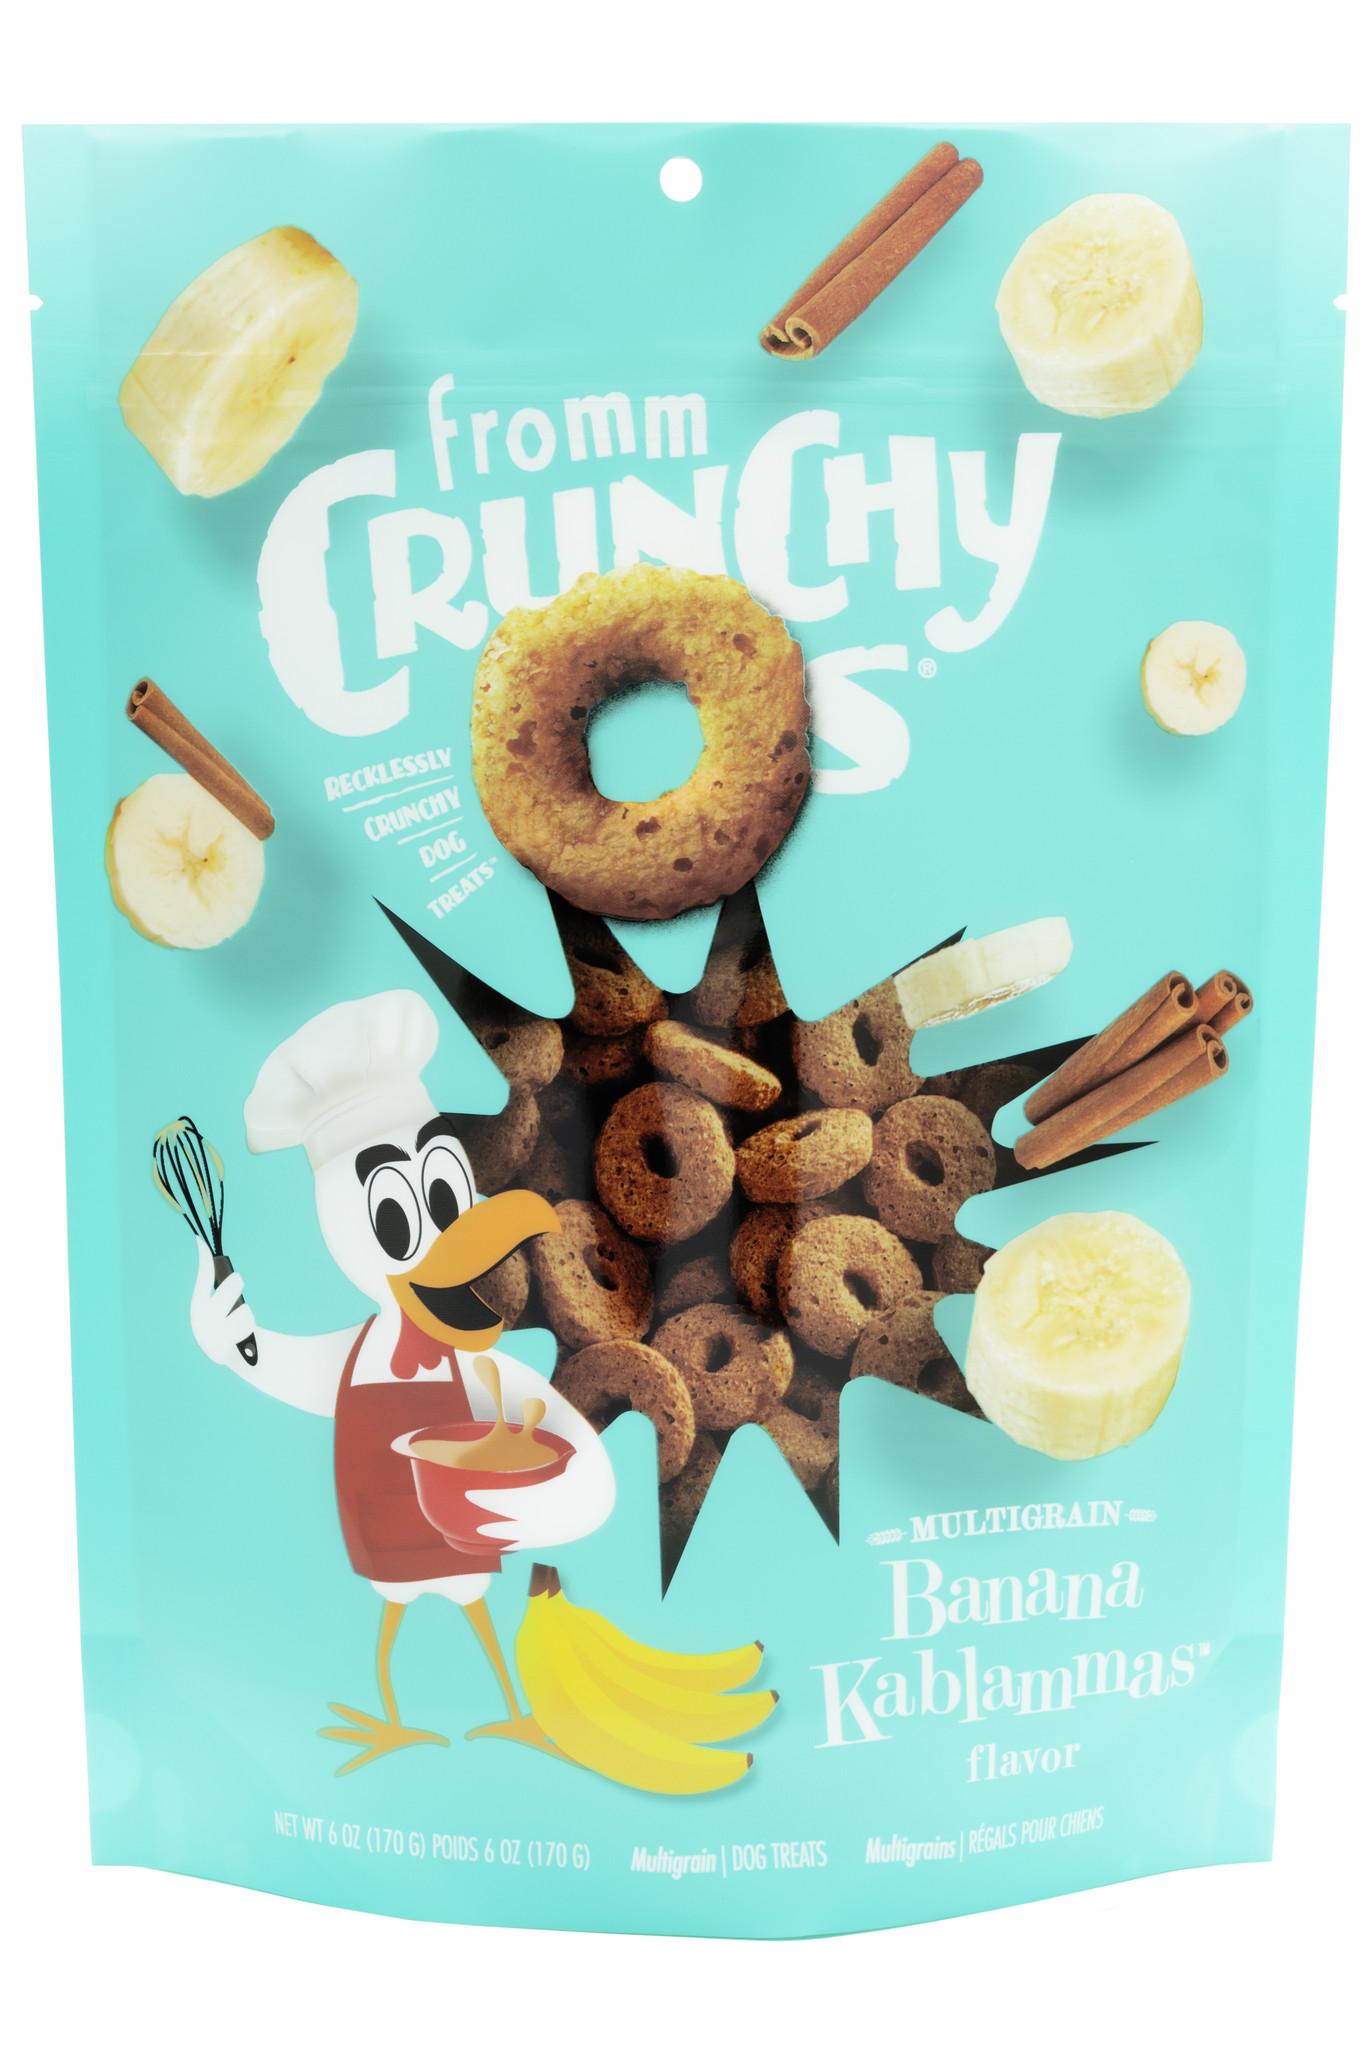 Fromm Fromm Crunchy-O's Banana Kablammas Dog Treat 6oz